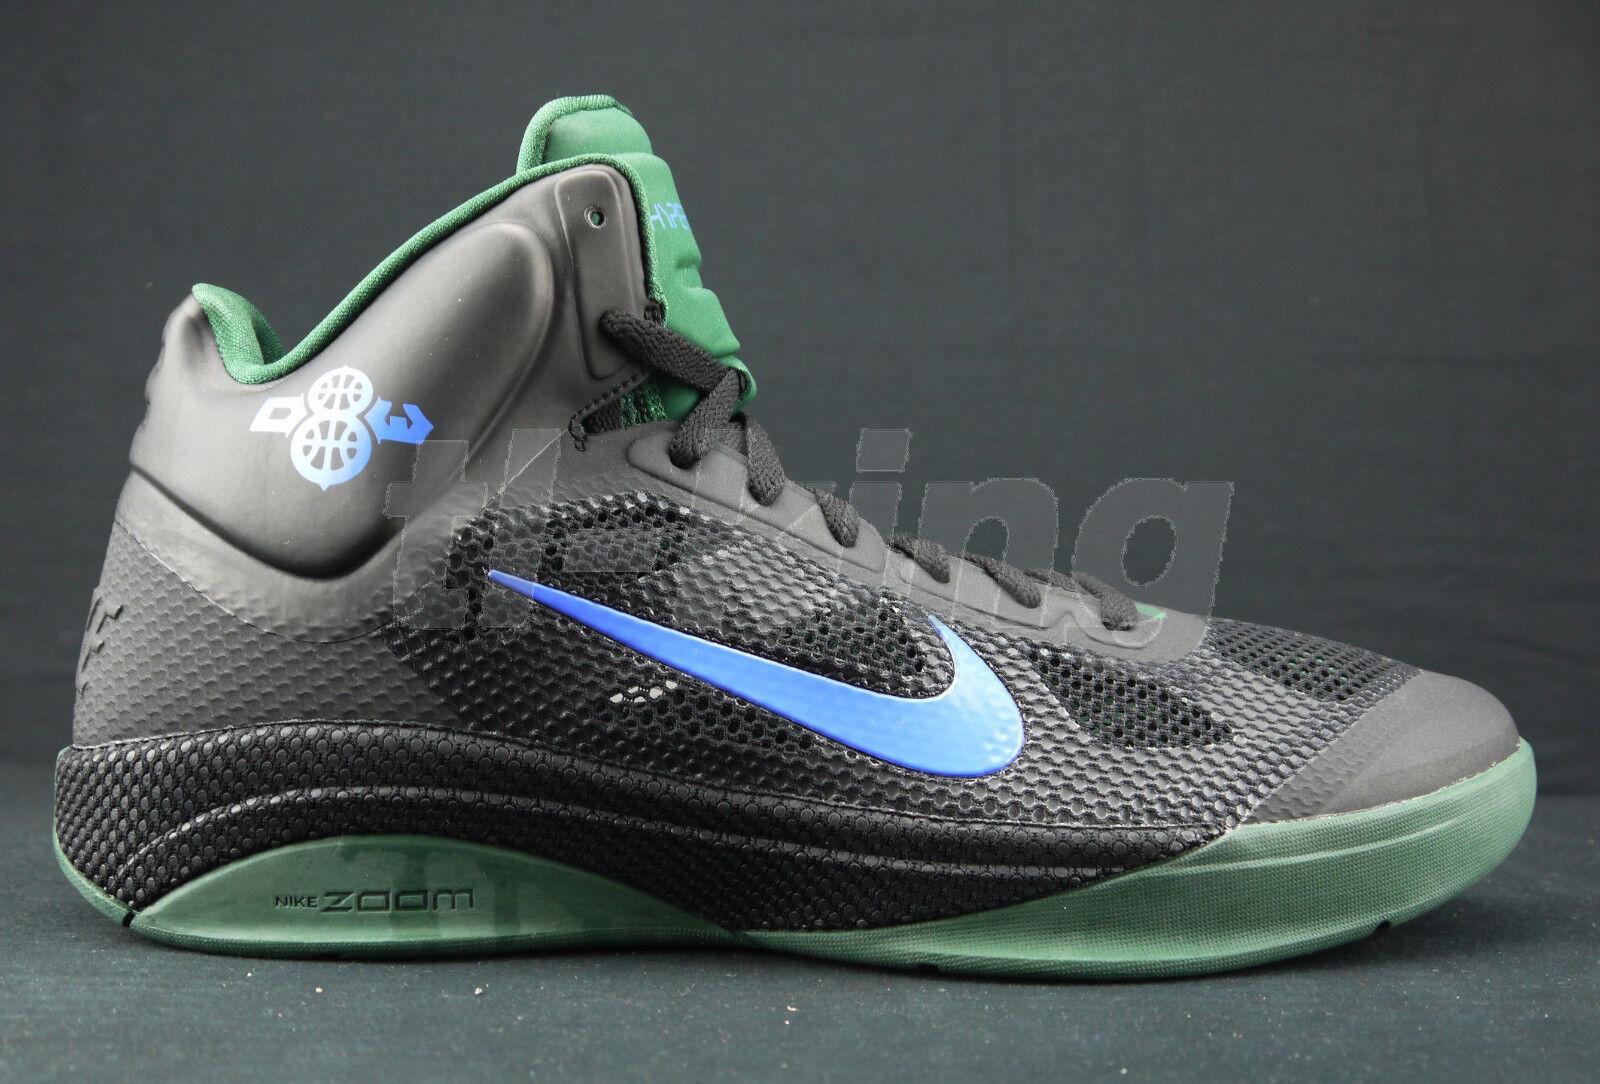 Nike Hyperfuse Deron Williams PE Uath Jazz sz 13.5 Right Shoe Only